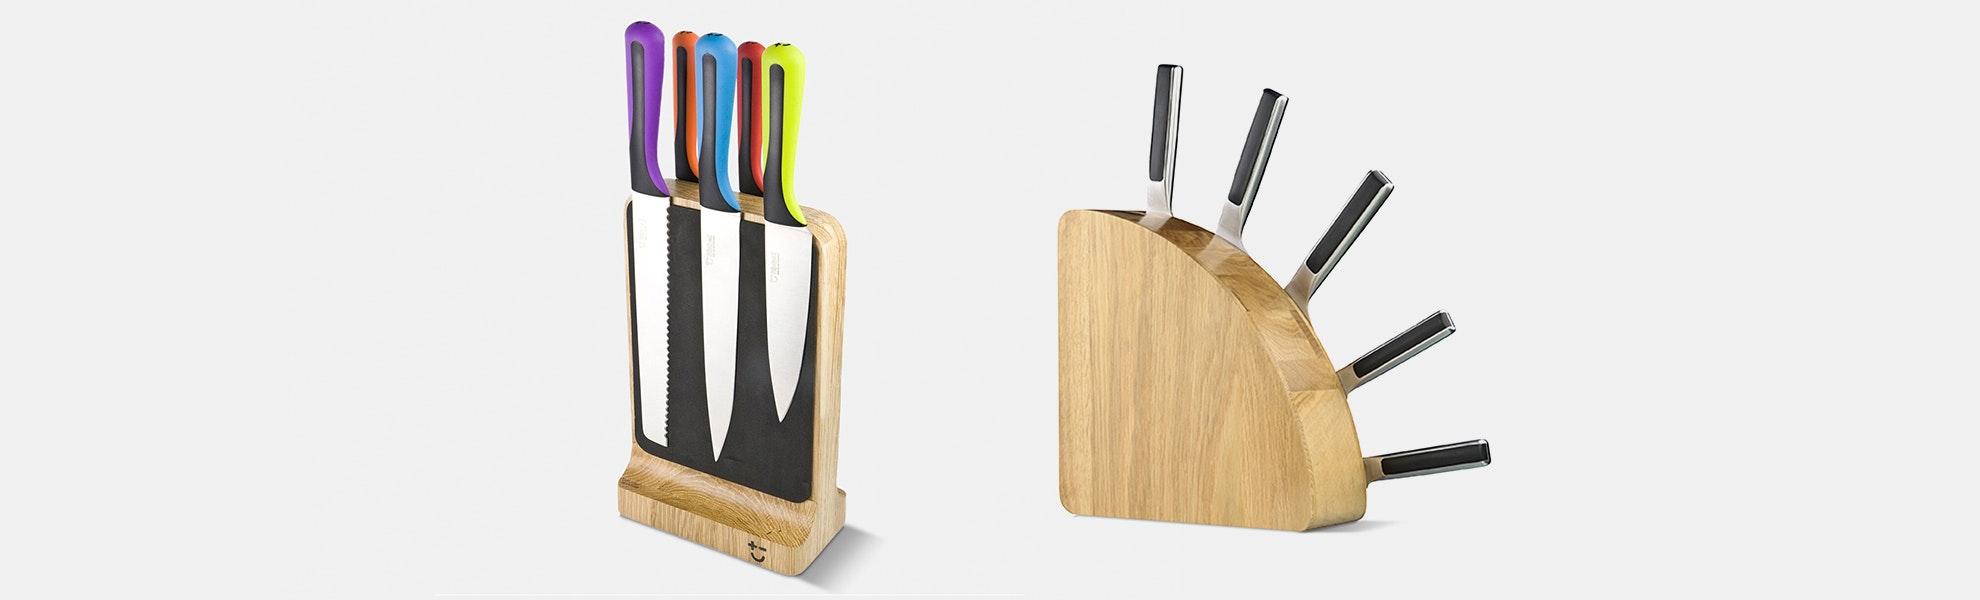 Bisbell Magnabloc Soft Touch Knife Blocks